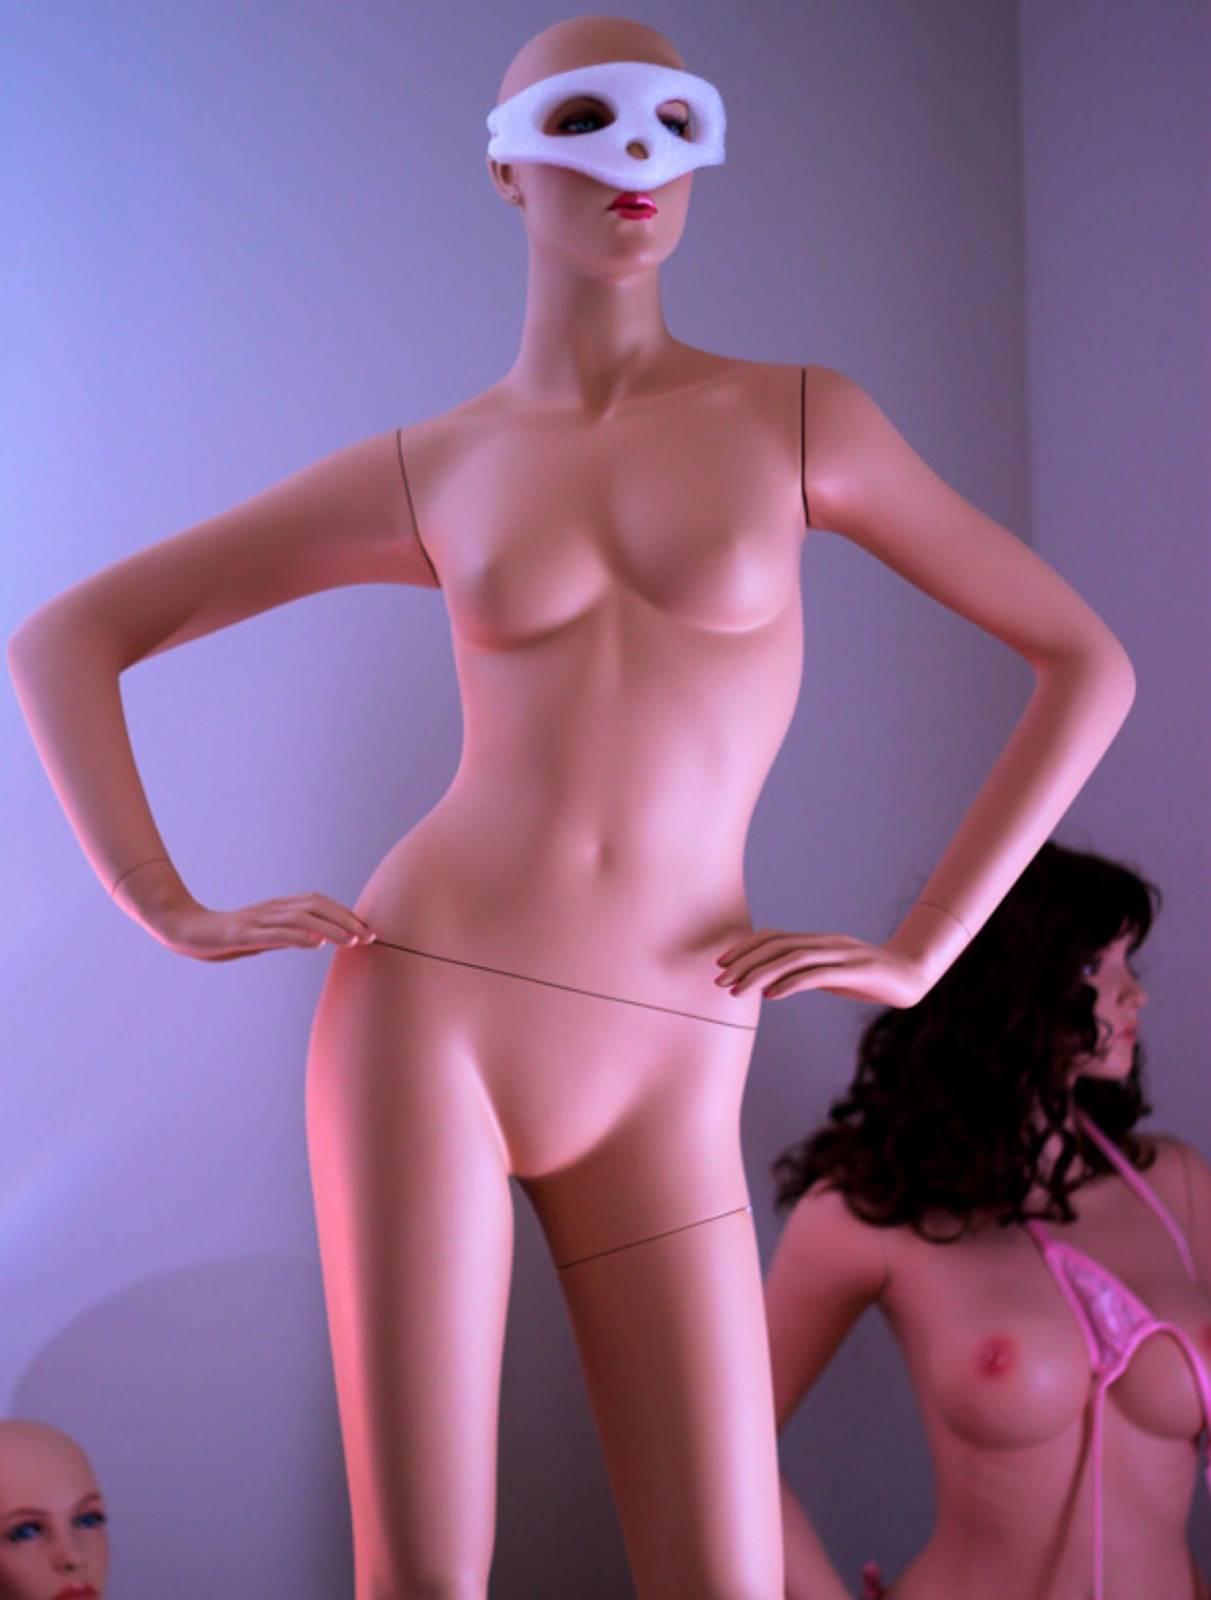 Naked mannequin porn, irish naked couple